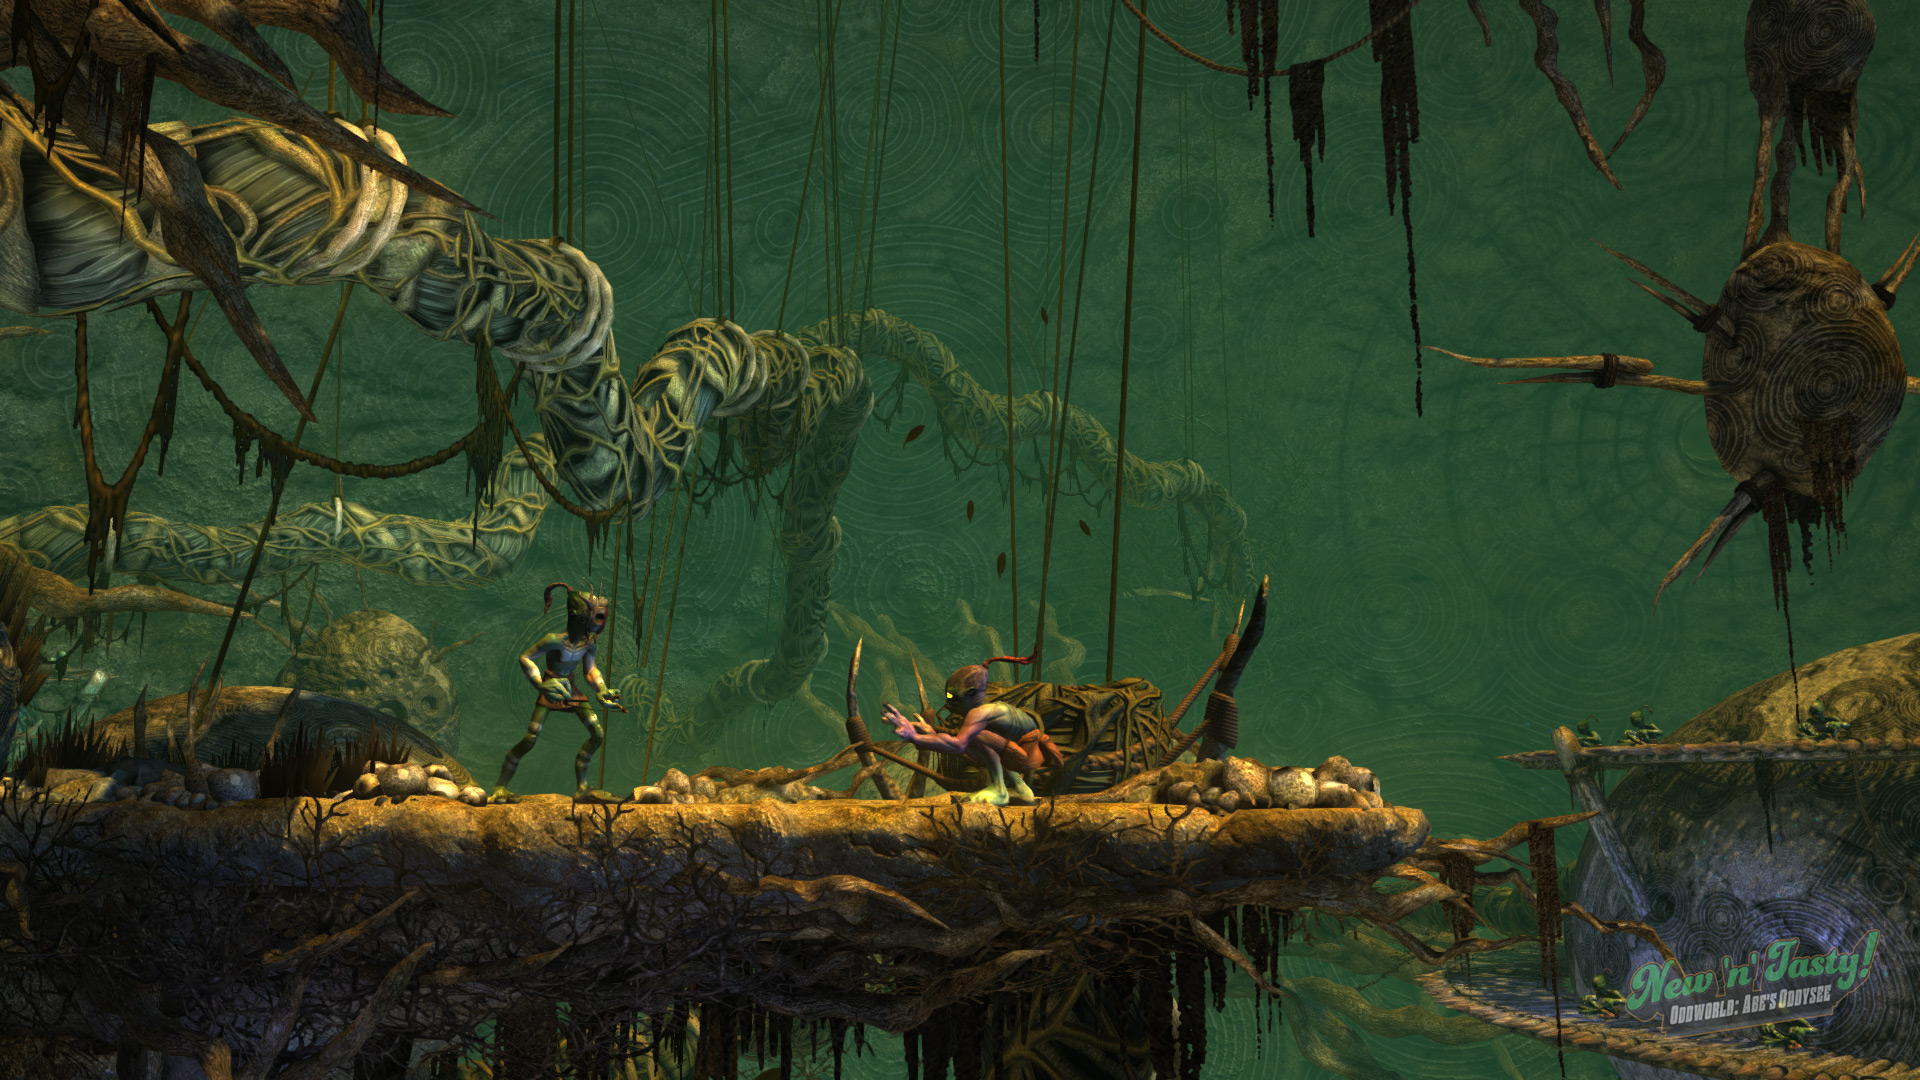 Oddworld: New 'n' Tasty on Steam on